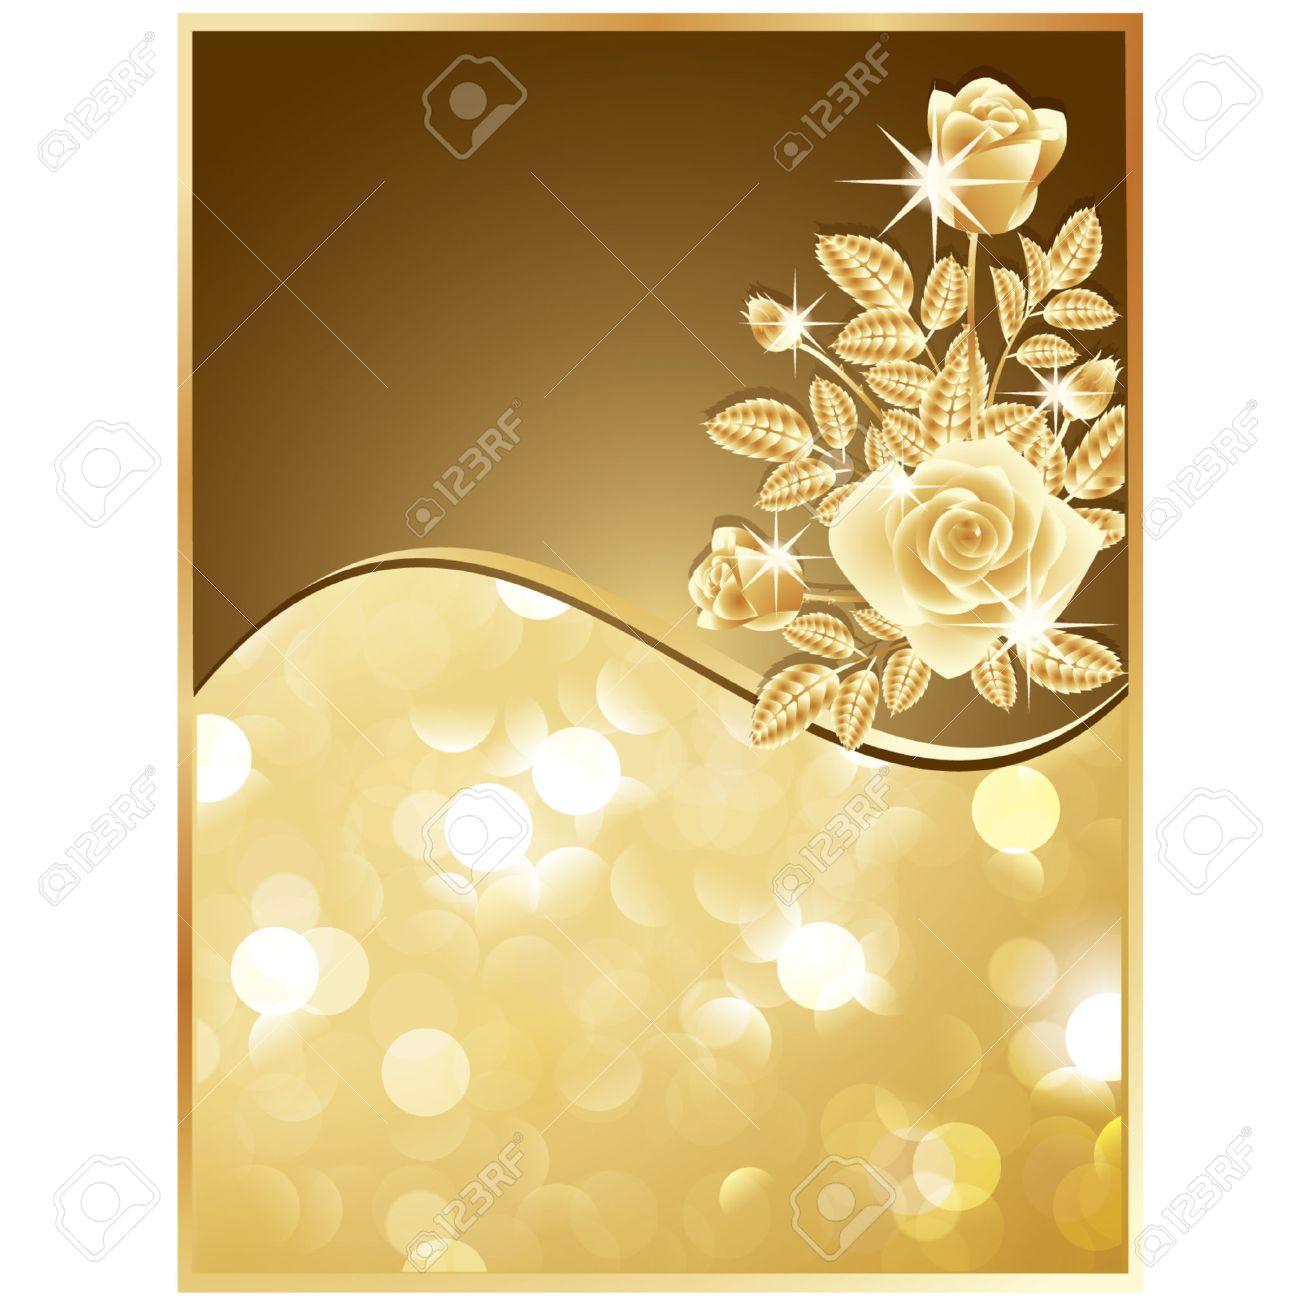 5f3dcddb4606 Invitation card with golden roses. vector illustration Stock Vector -  8781965